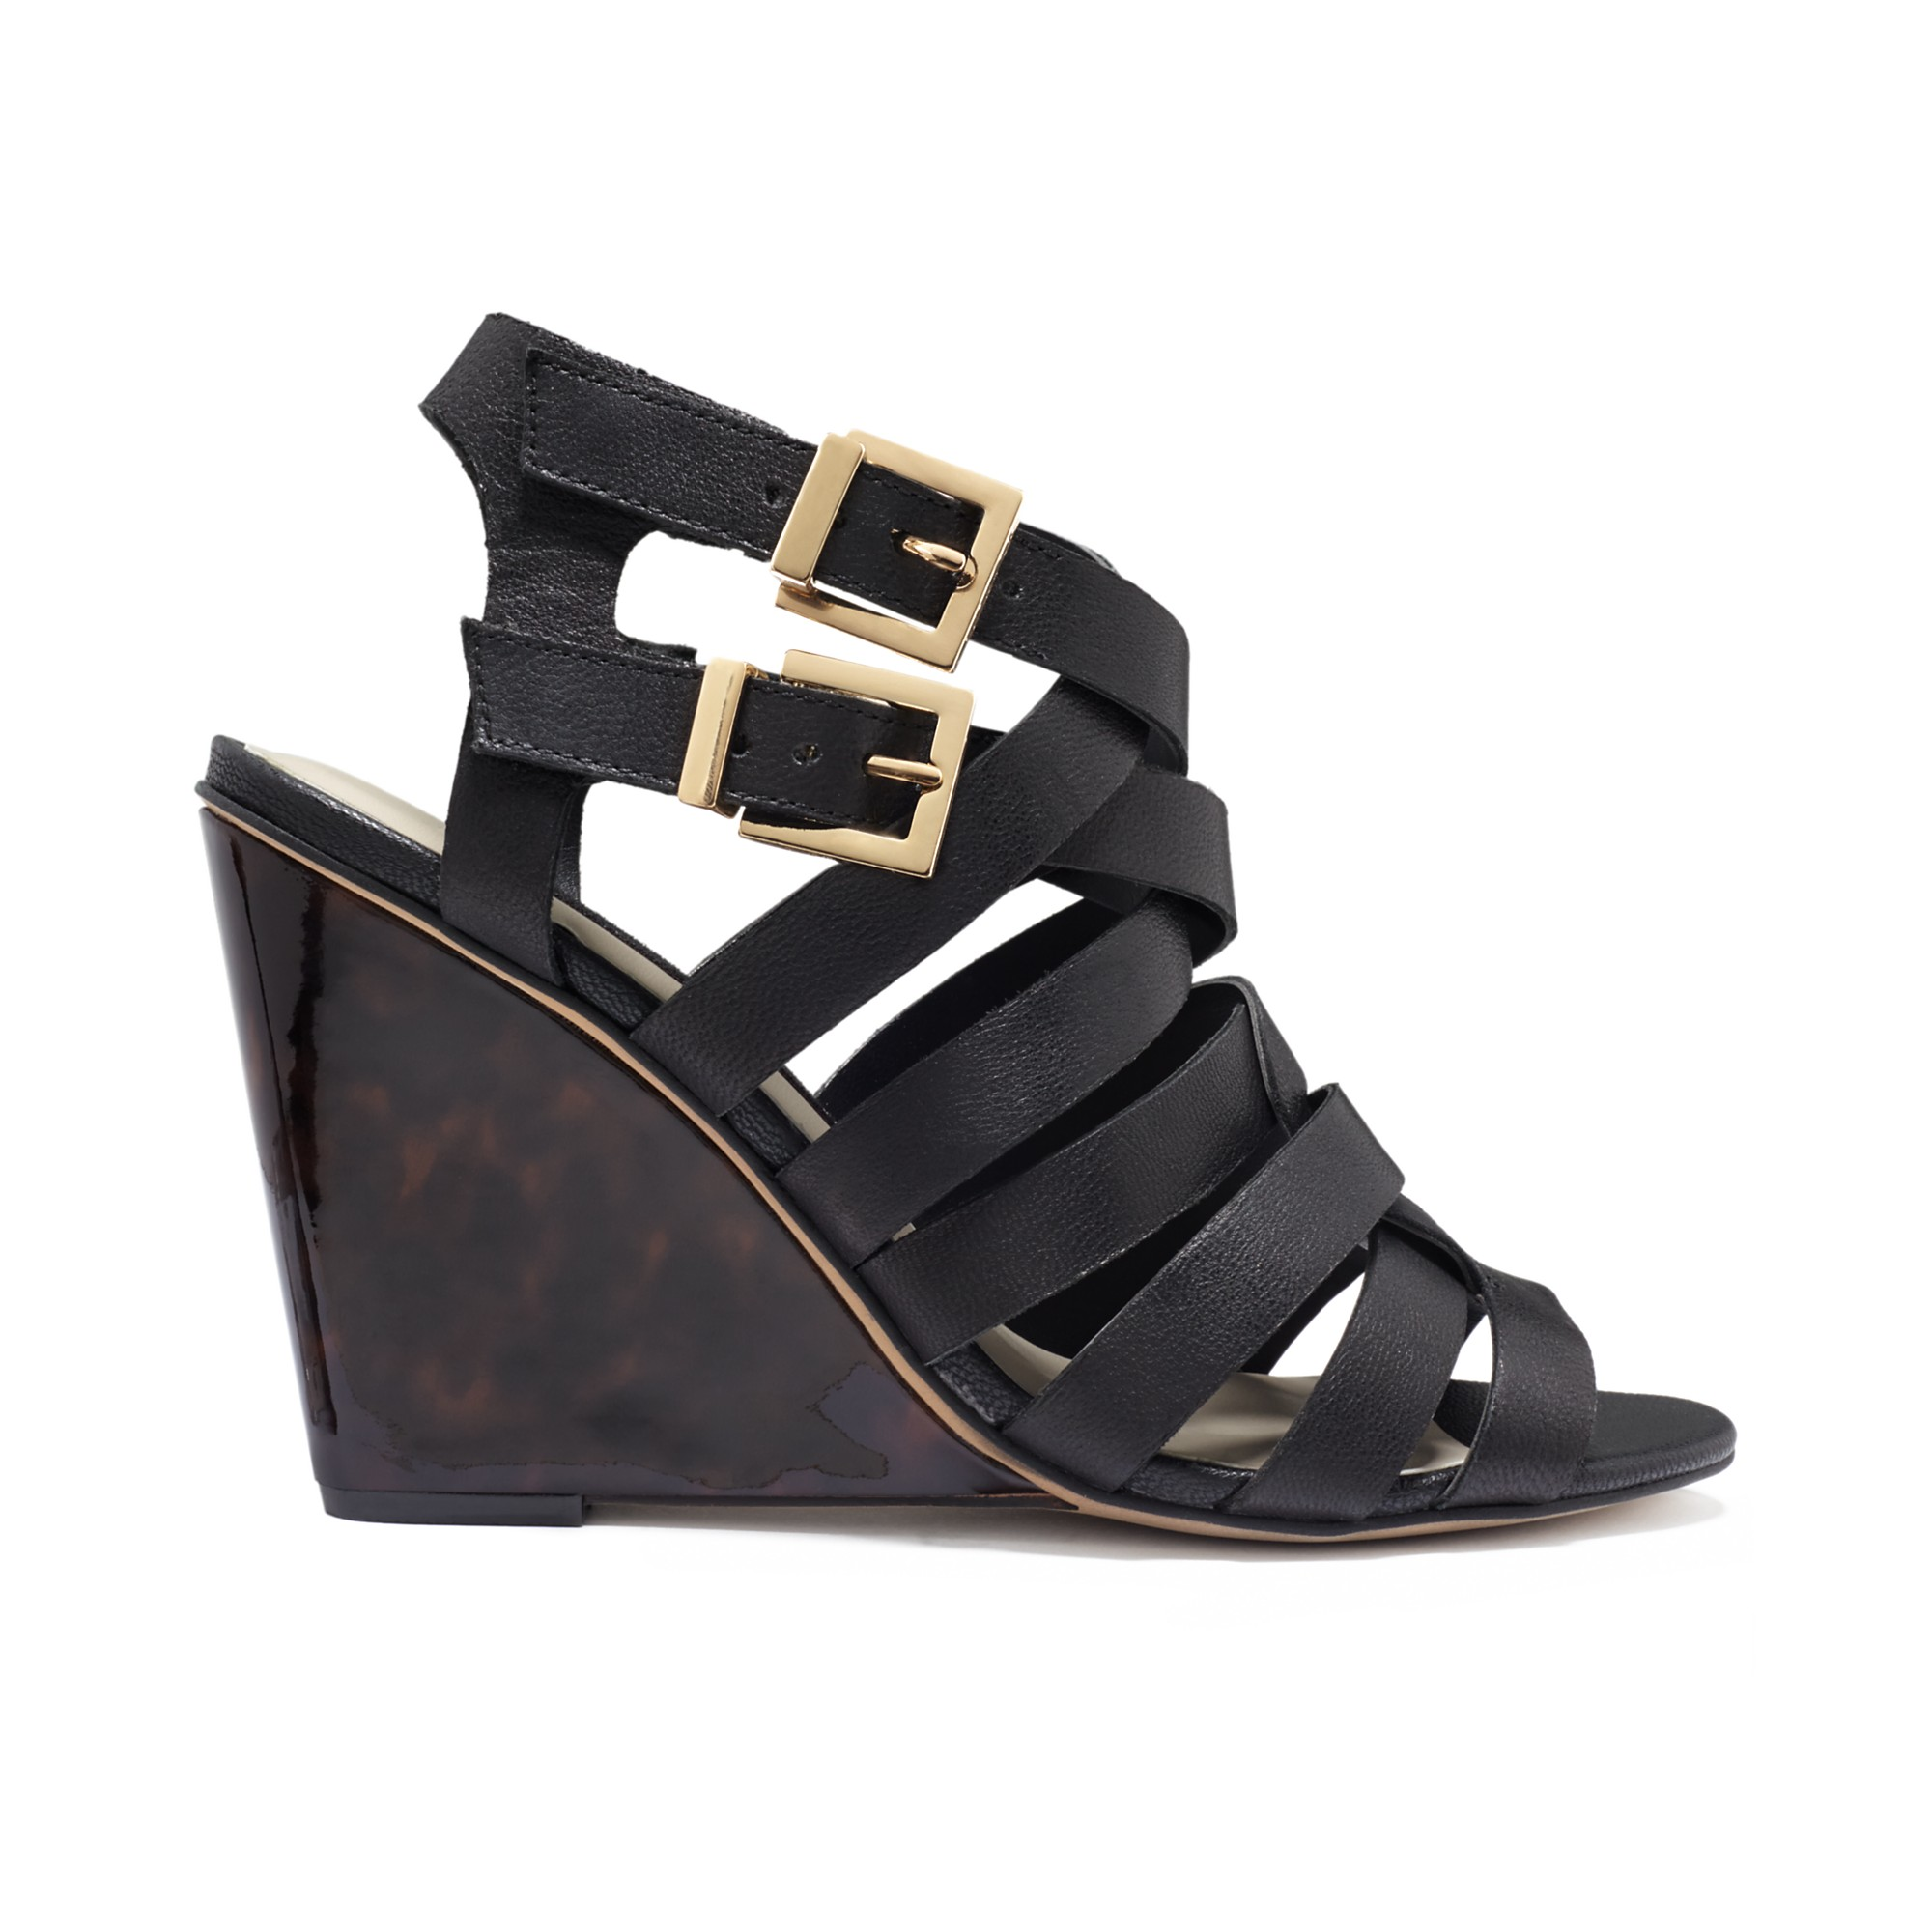 steven by steve madden midori wedge sandals in black blush leather lyst. Black Bedroom Furniture Sets. Home Design Ideas